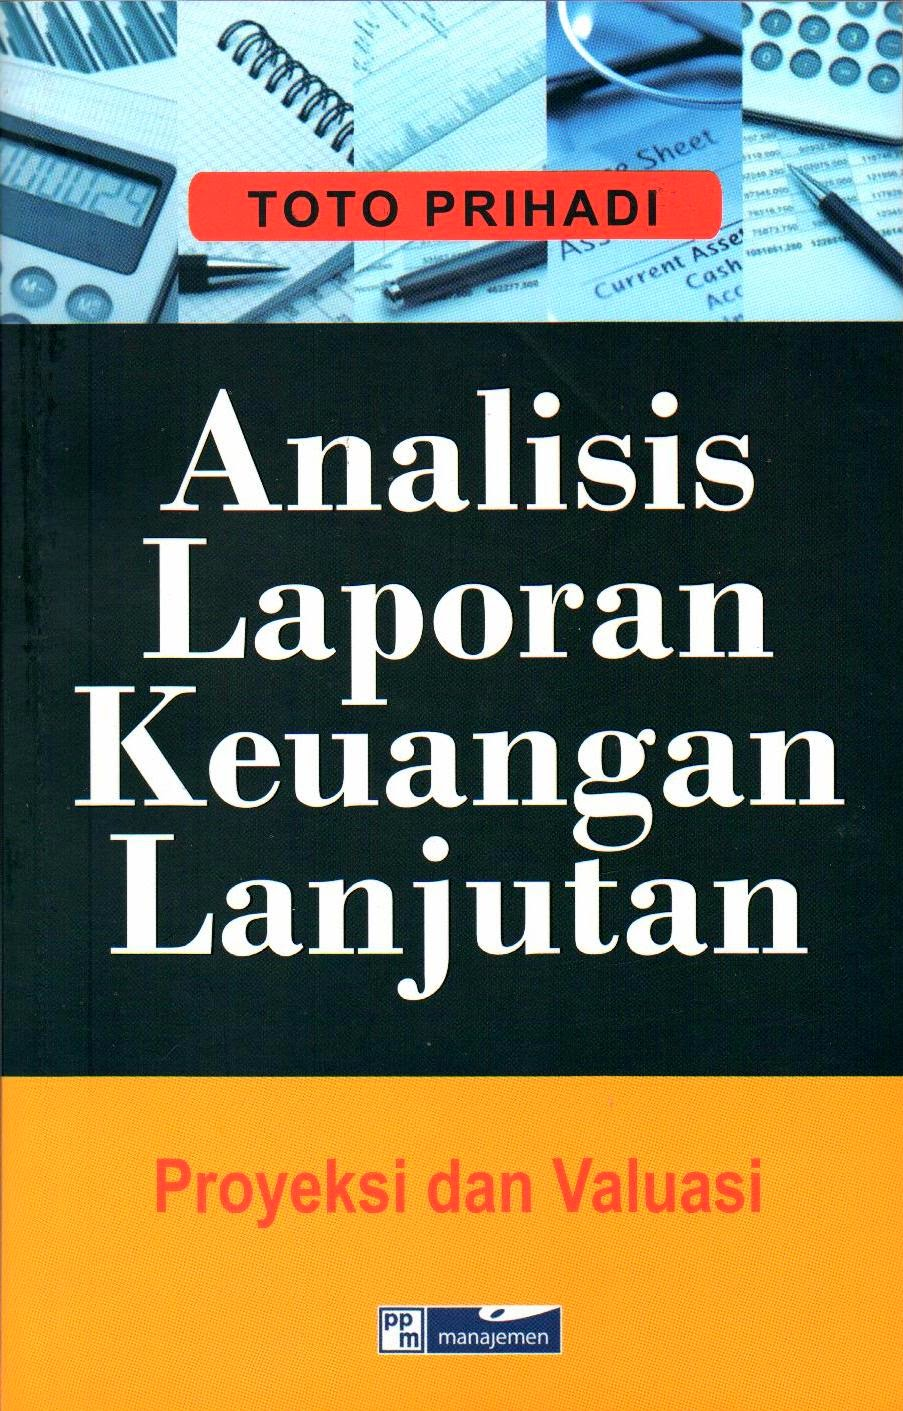 Toko Buku Wira Analisis Laporan Keuangan Edisi 10 2 By Subramanyam Lanjutan Proyeksi Dan Valuasi Penulis Toto Prihadi